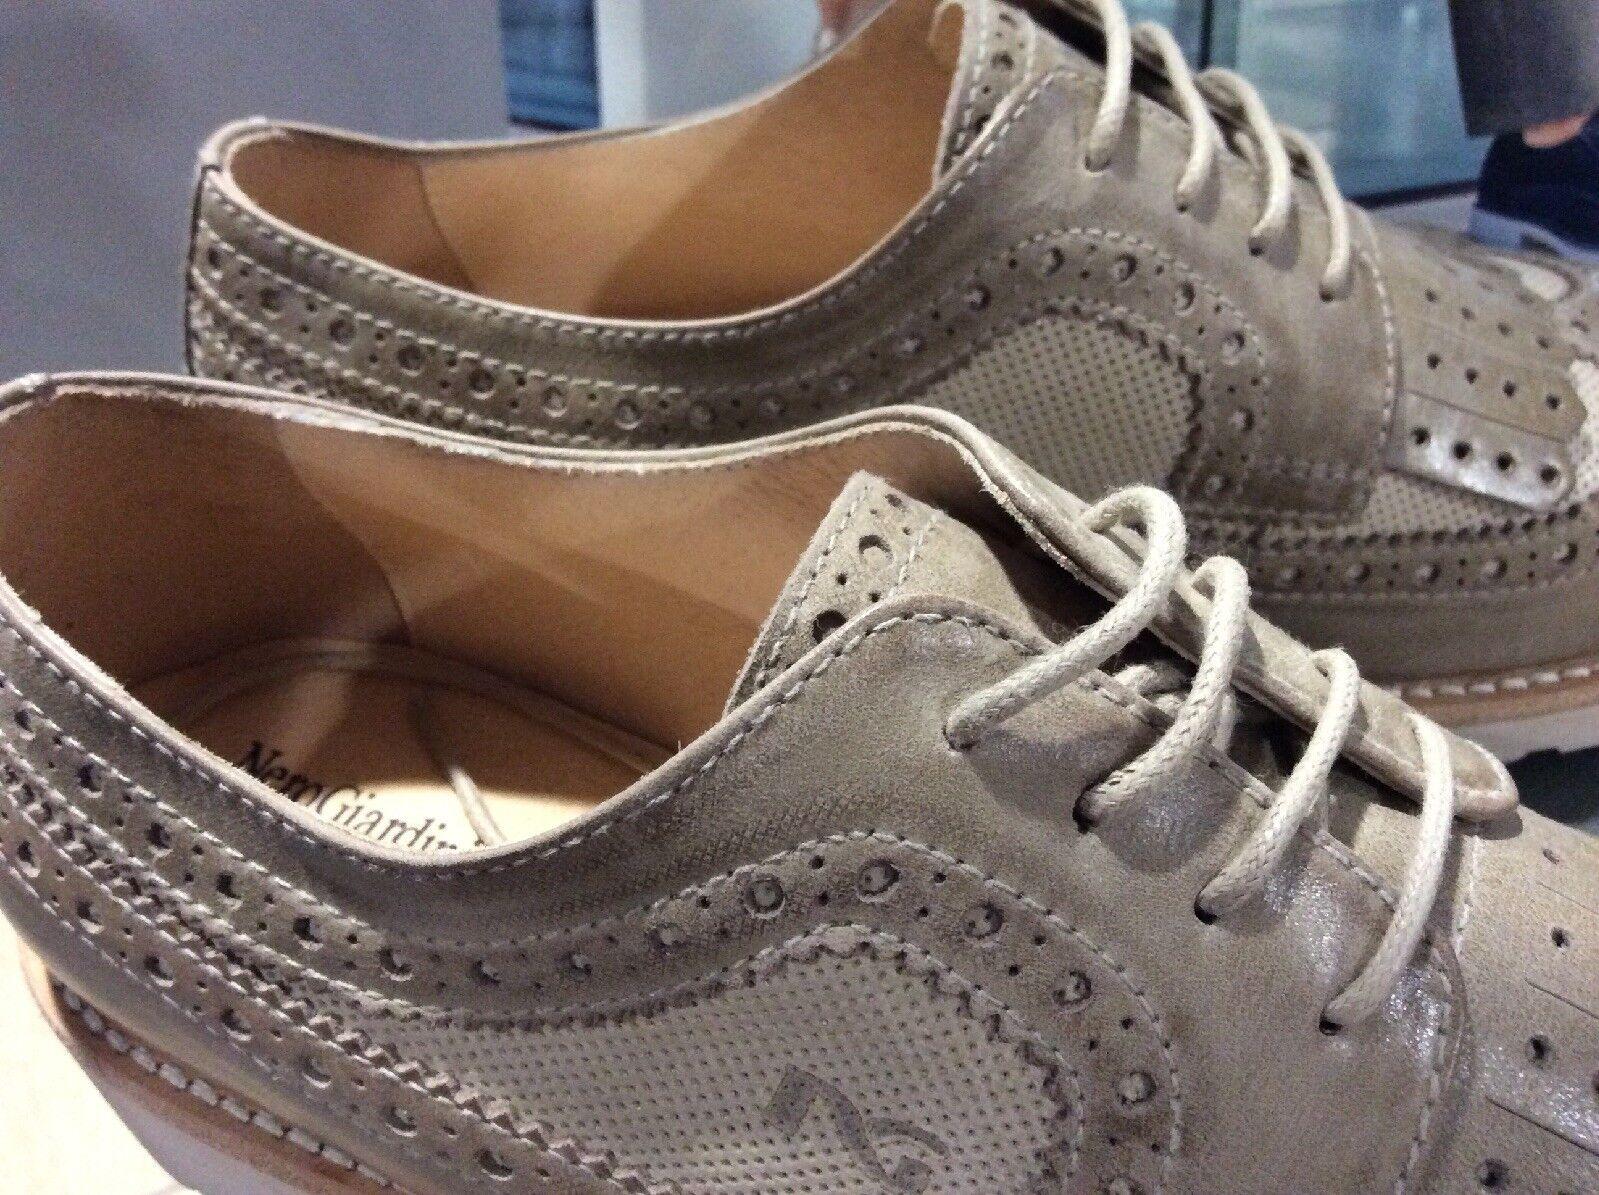 SCARPE INGLESE scarpe da ginnastica NERO GIARDINI N.40 N.40 N.40 PREZZO SHOCK  -50% INCrossoIBILEEEE | benevento  | Maschio/Ragazze Scarpa  696600